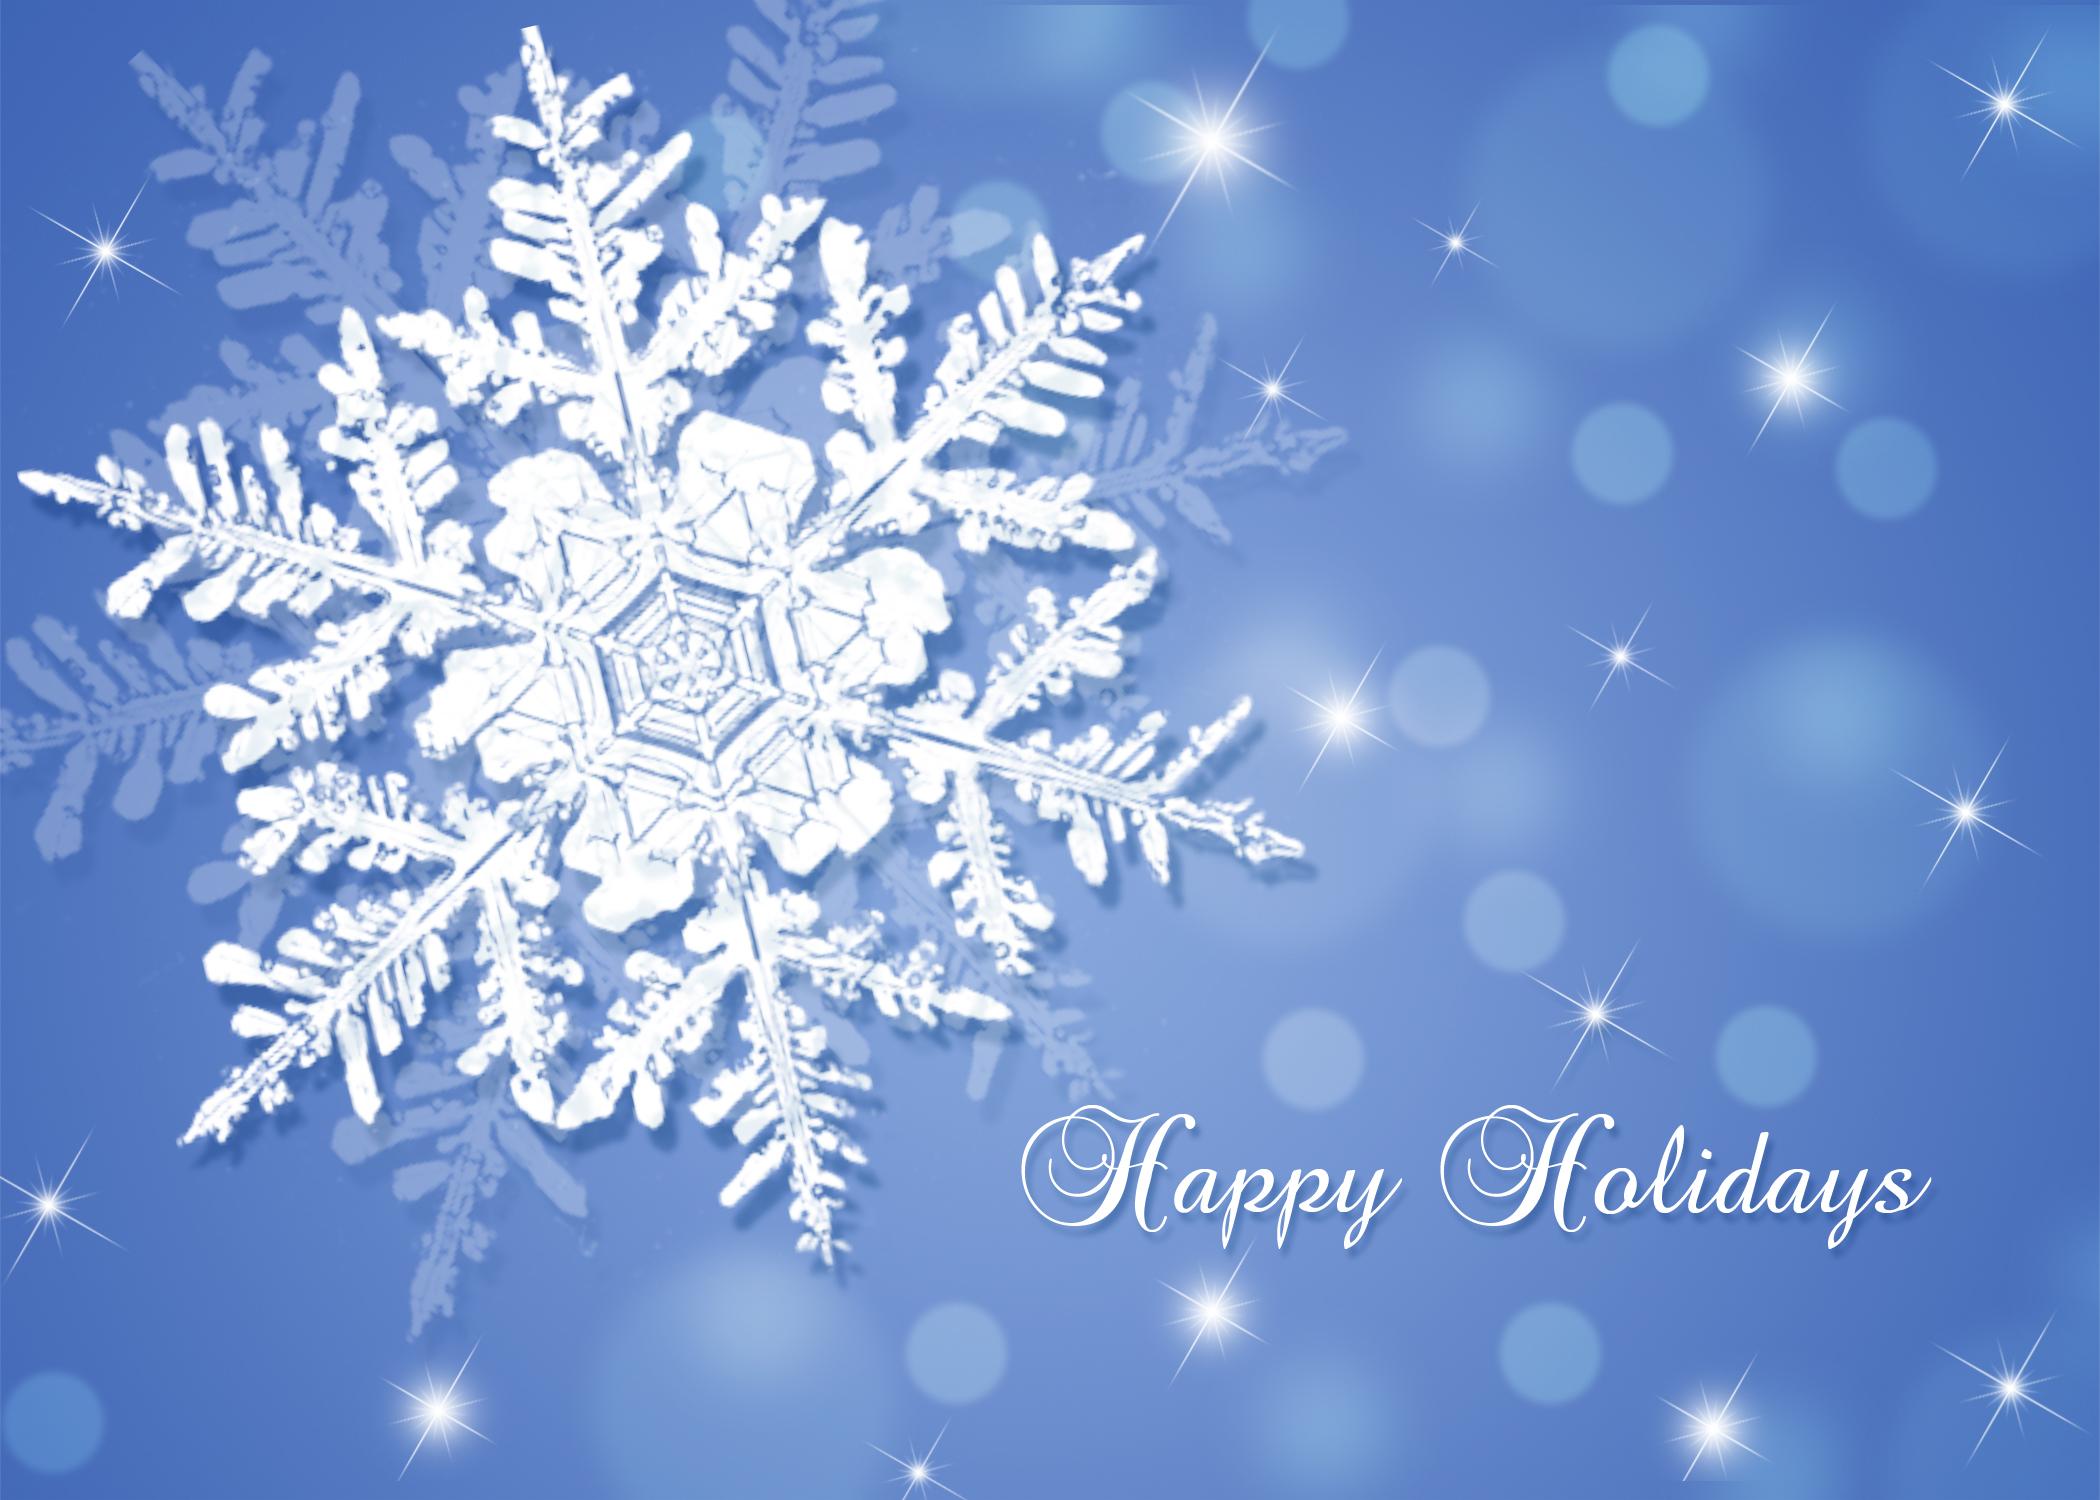 Snowflake_HappyHolidays2012.jpg